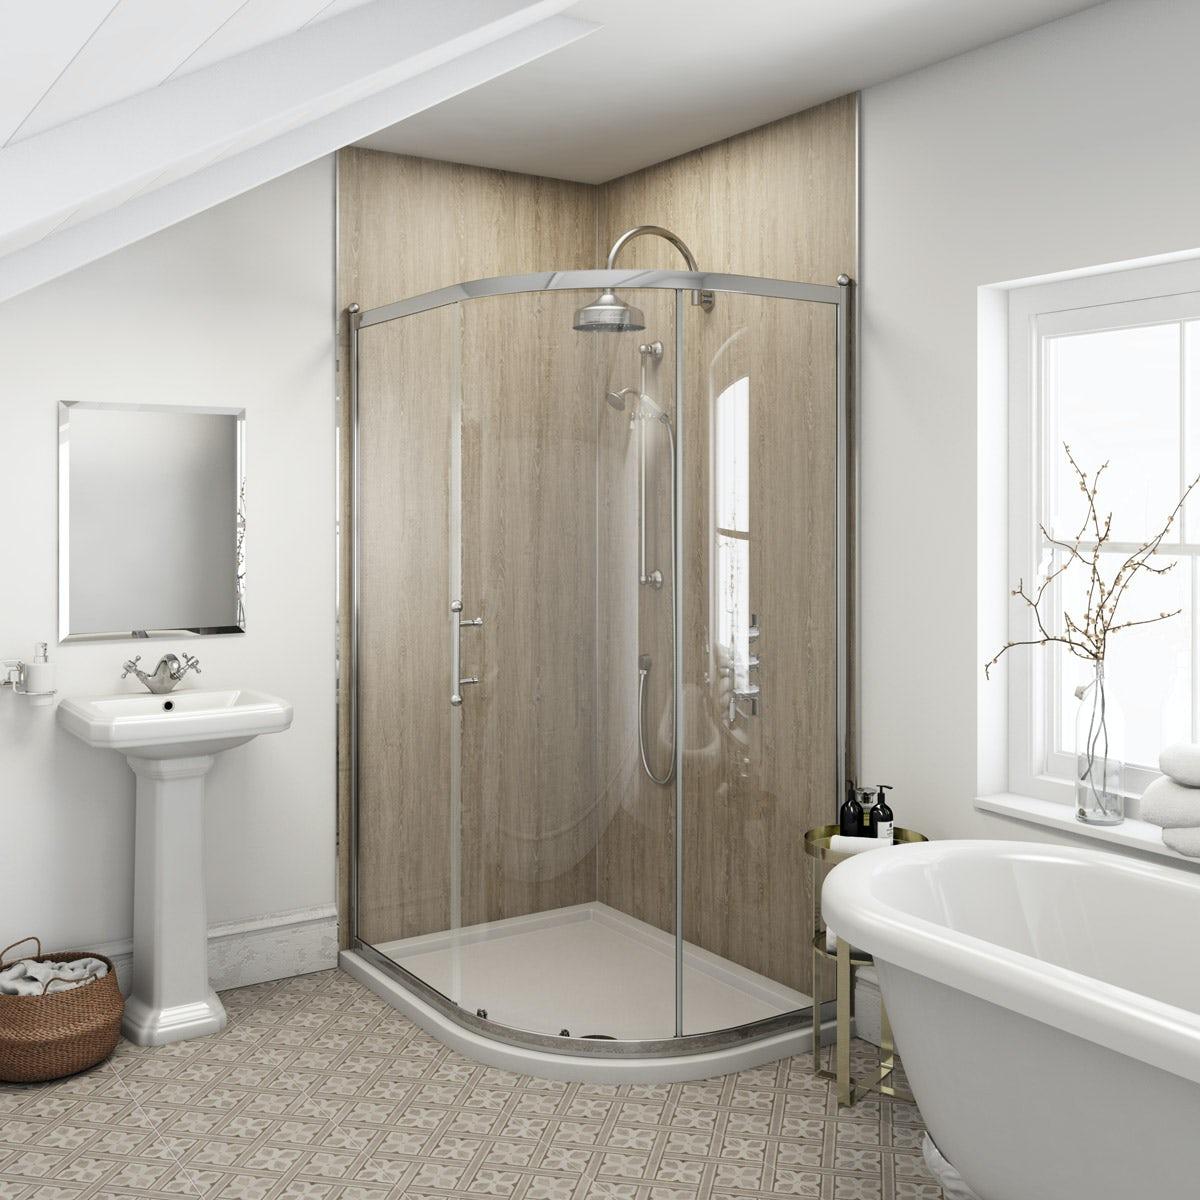 Multipanel Heritage Delano Oak unlipped shower wall panel 2400 x 1200